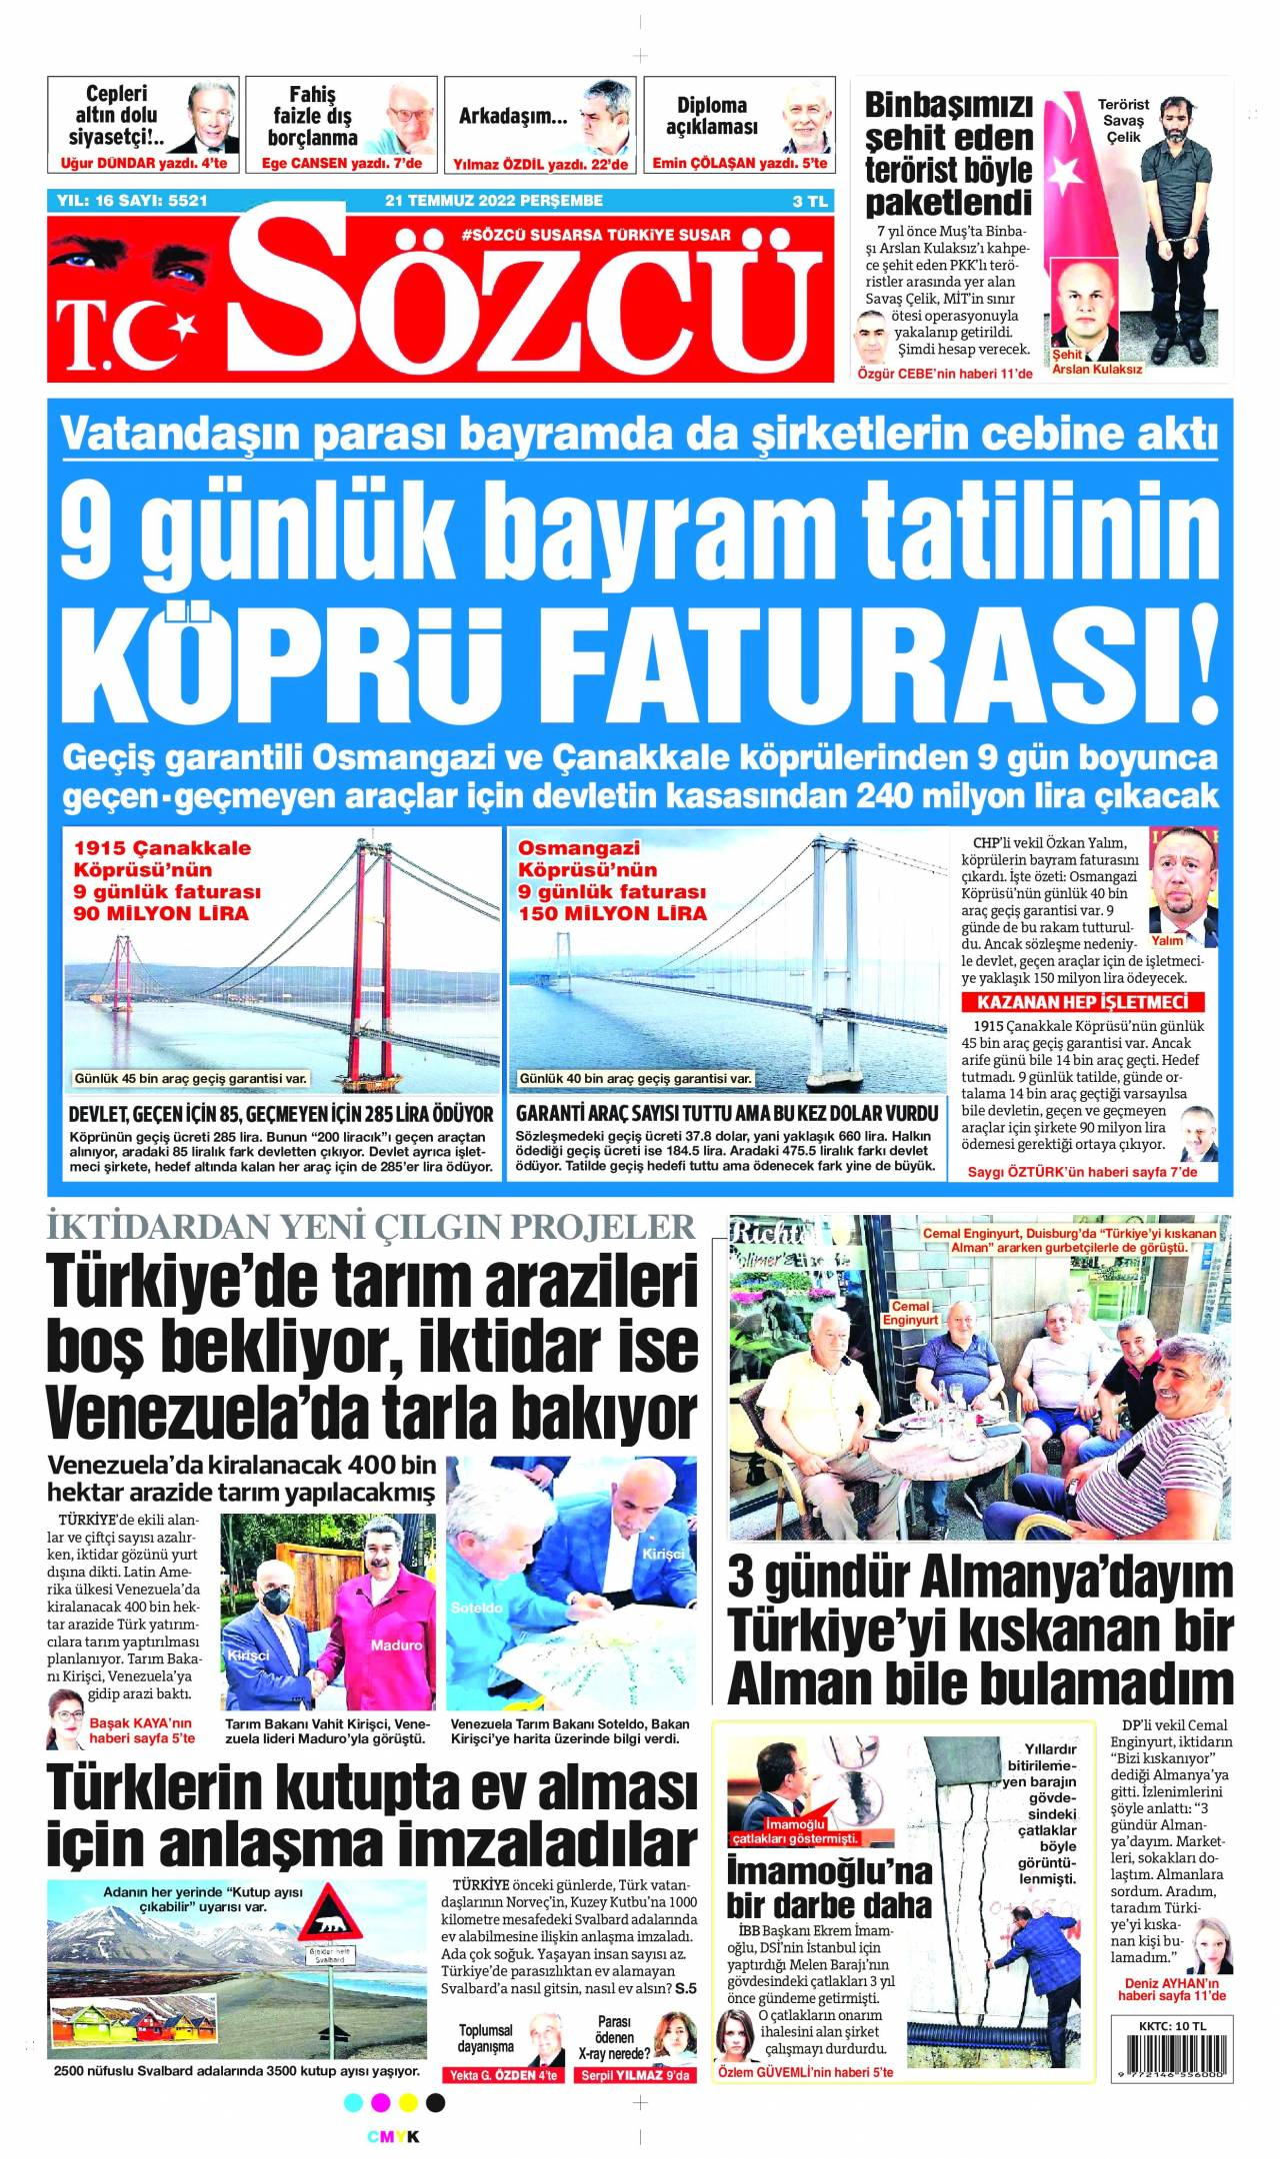 23 Ağustos 2019, Cuma sozcu Gazetesi